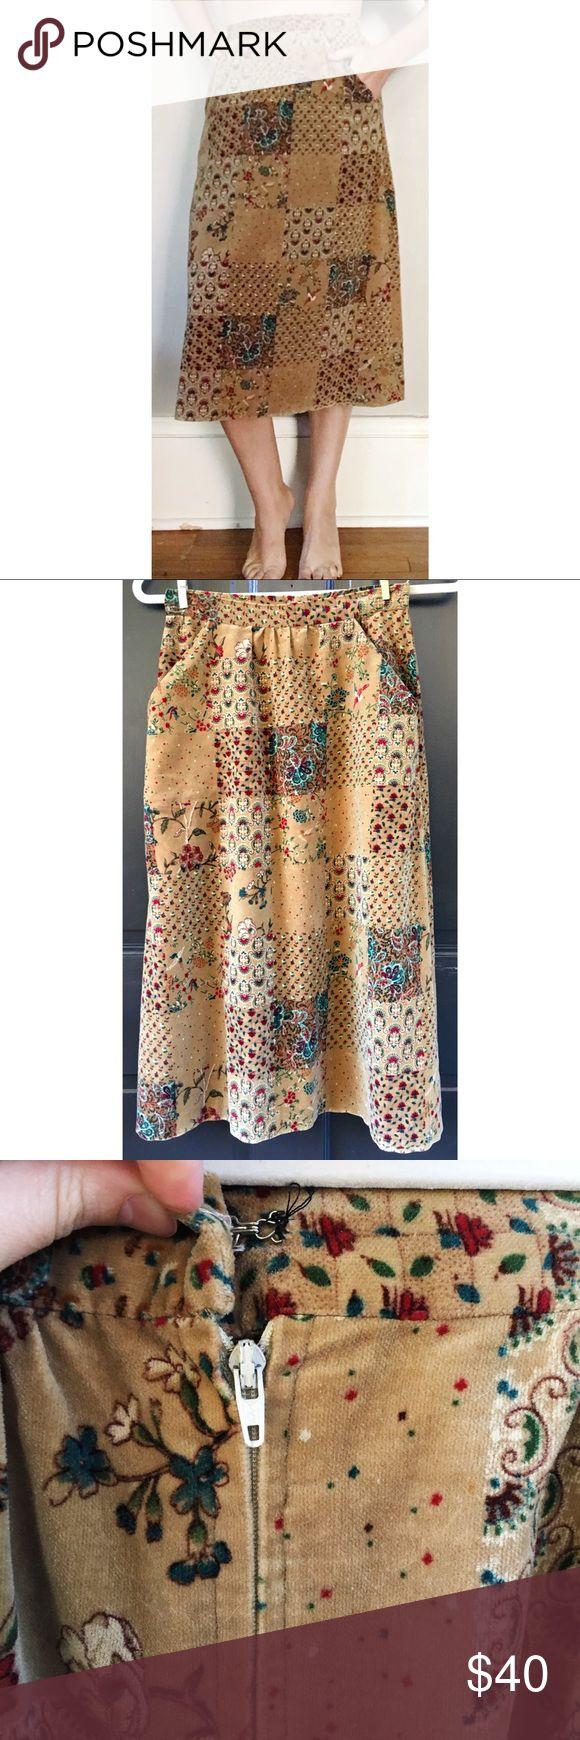 "Vintage 70s Velvet Patchwork Print Skirt XS ITEM: 70s Velvet Patchwork Print Skirt BRAND: Label missing COLOR: Camel SIZE: No size label CONDITION: excellent  MATERIAL: Velvet  MEASUREMENTS: 29 long, fits 25"" waist Vintage Skirts"